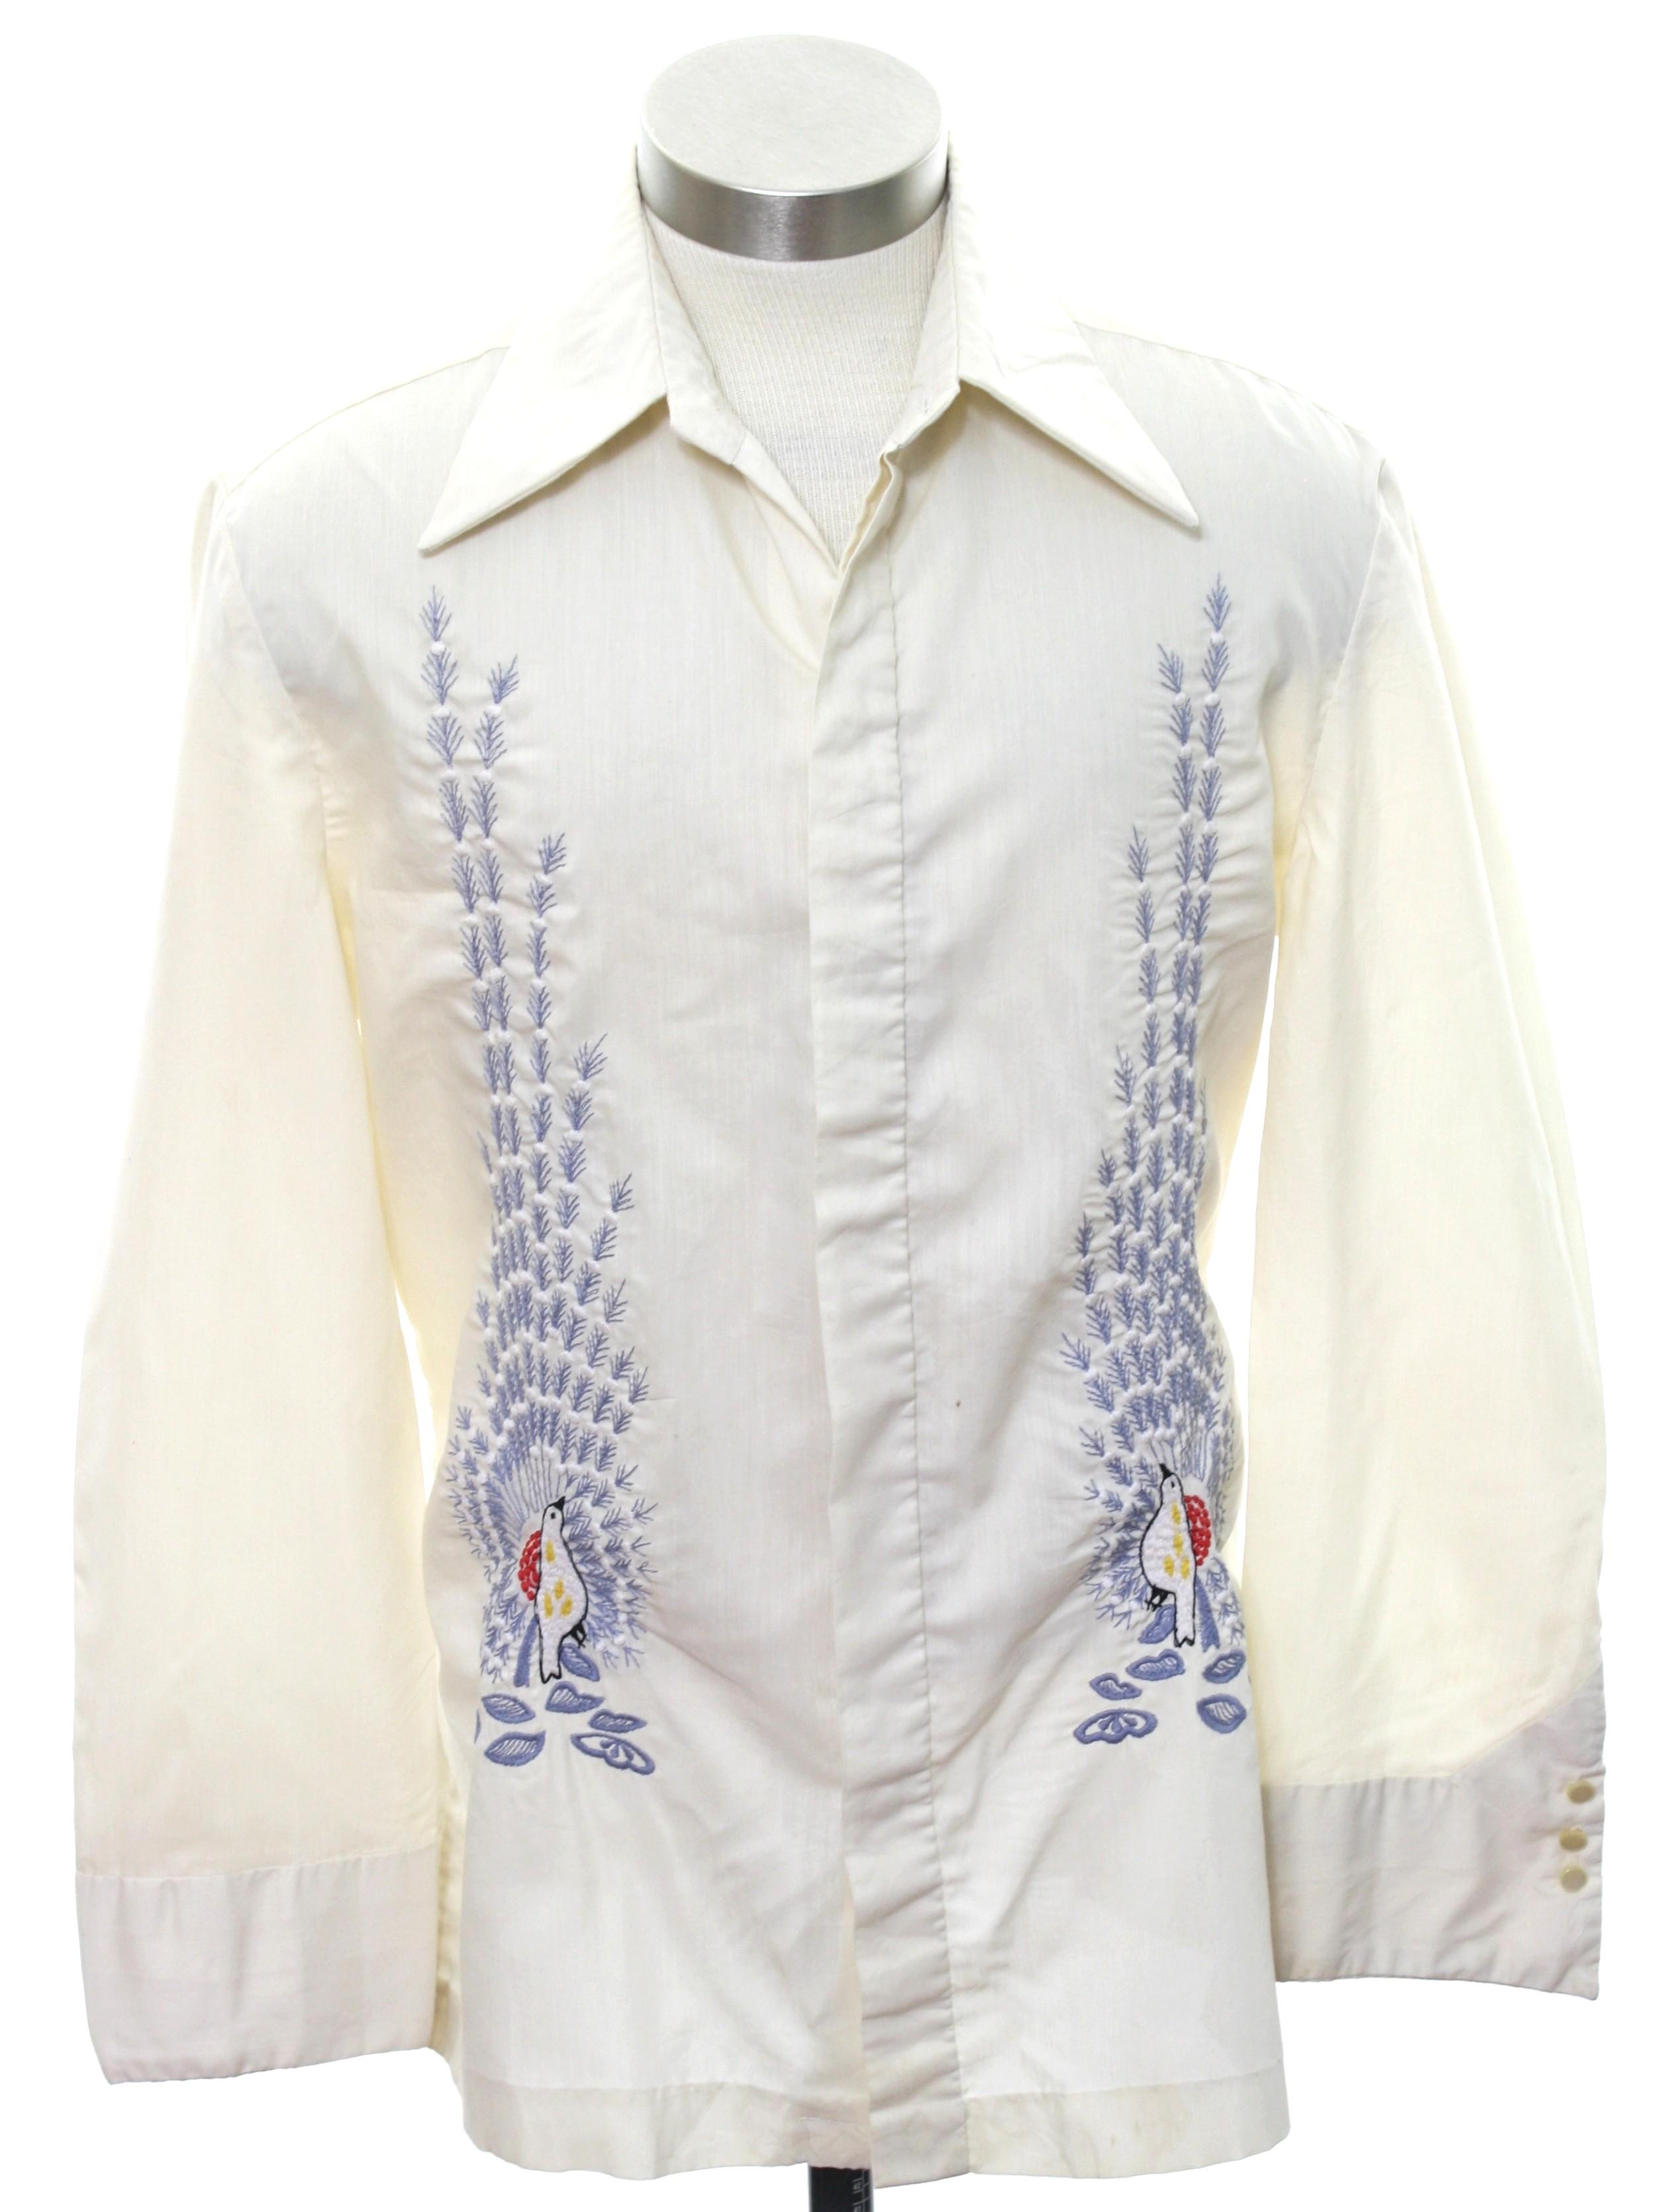 Seventies Vintage Hippie Shirt 70s No Label Boys Ivory